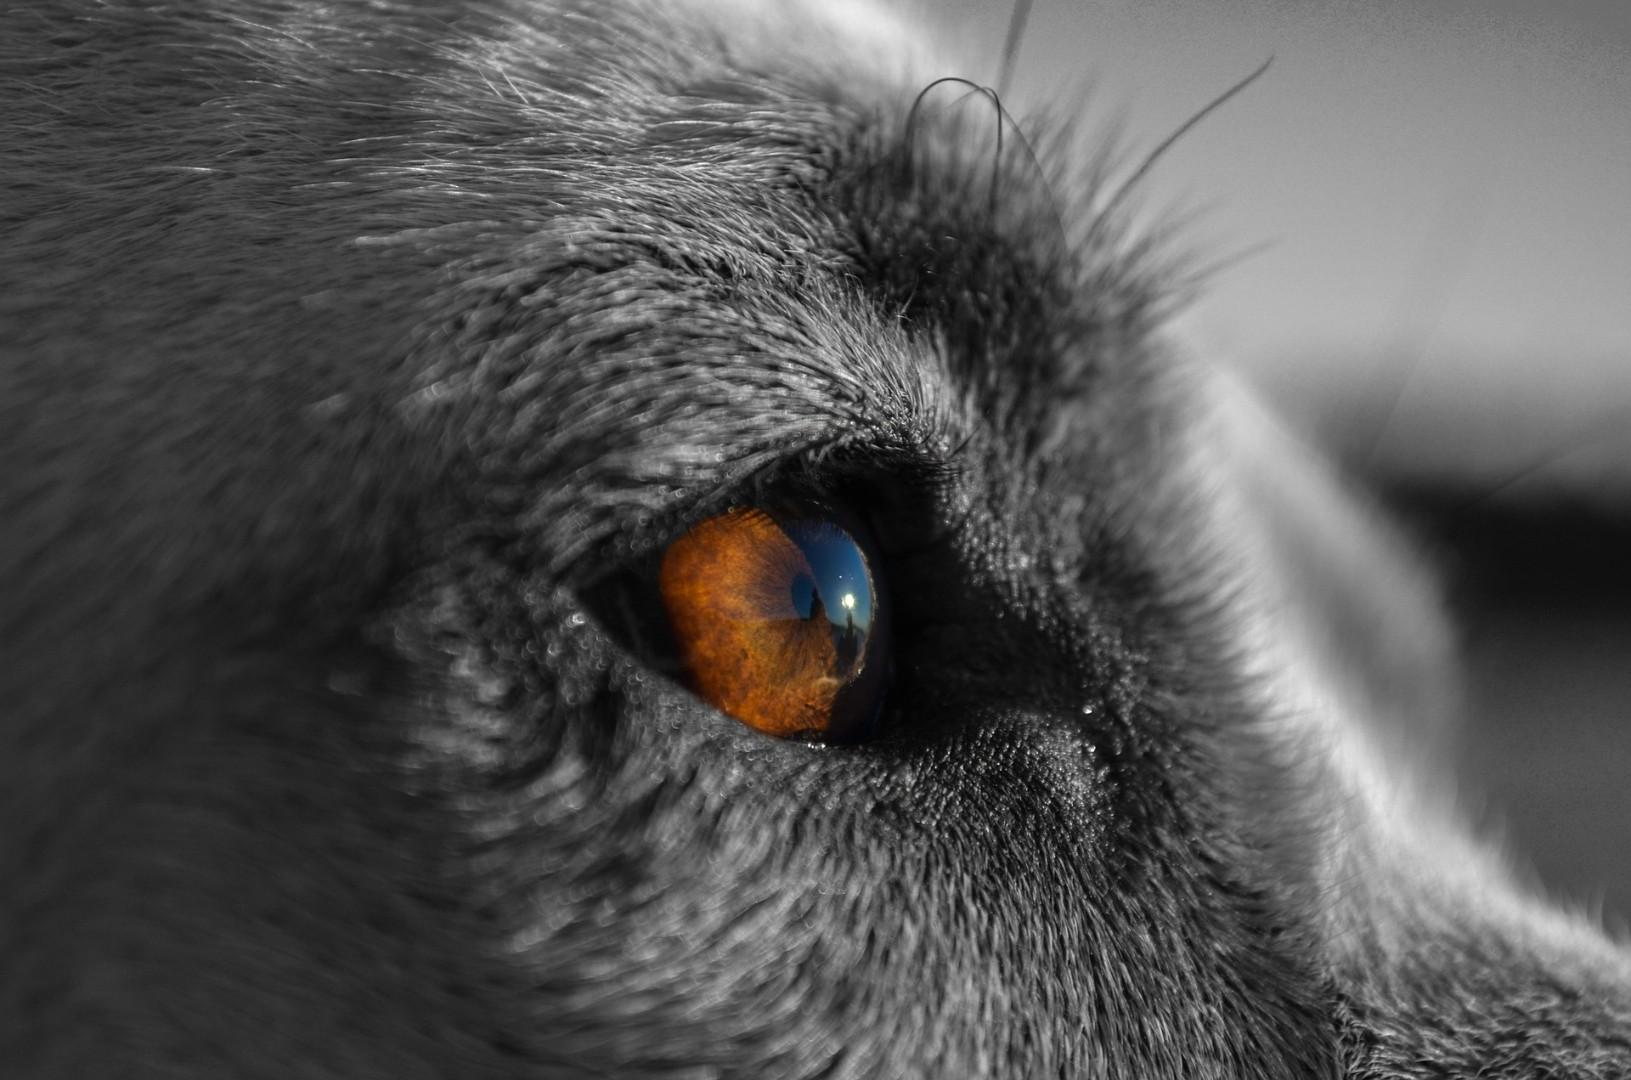 canine-863032_1920.jpg